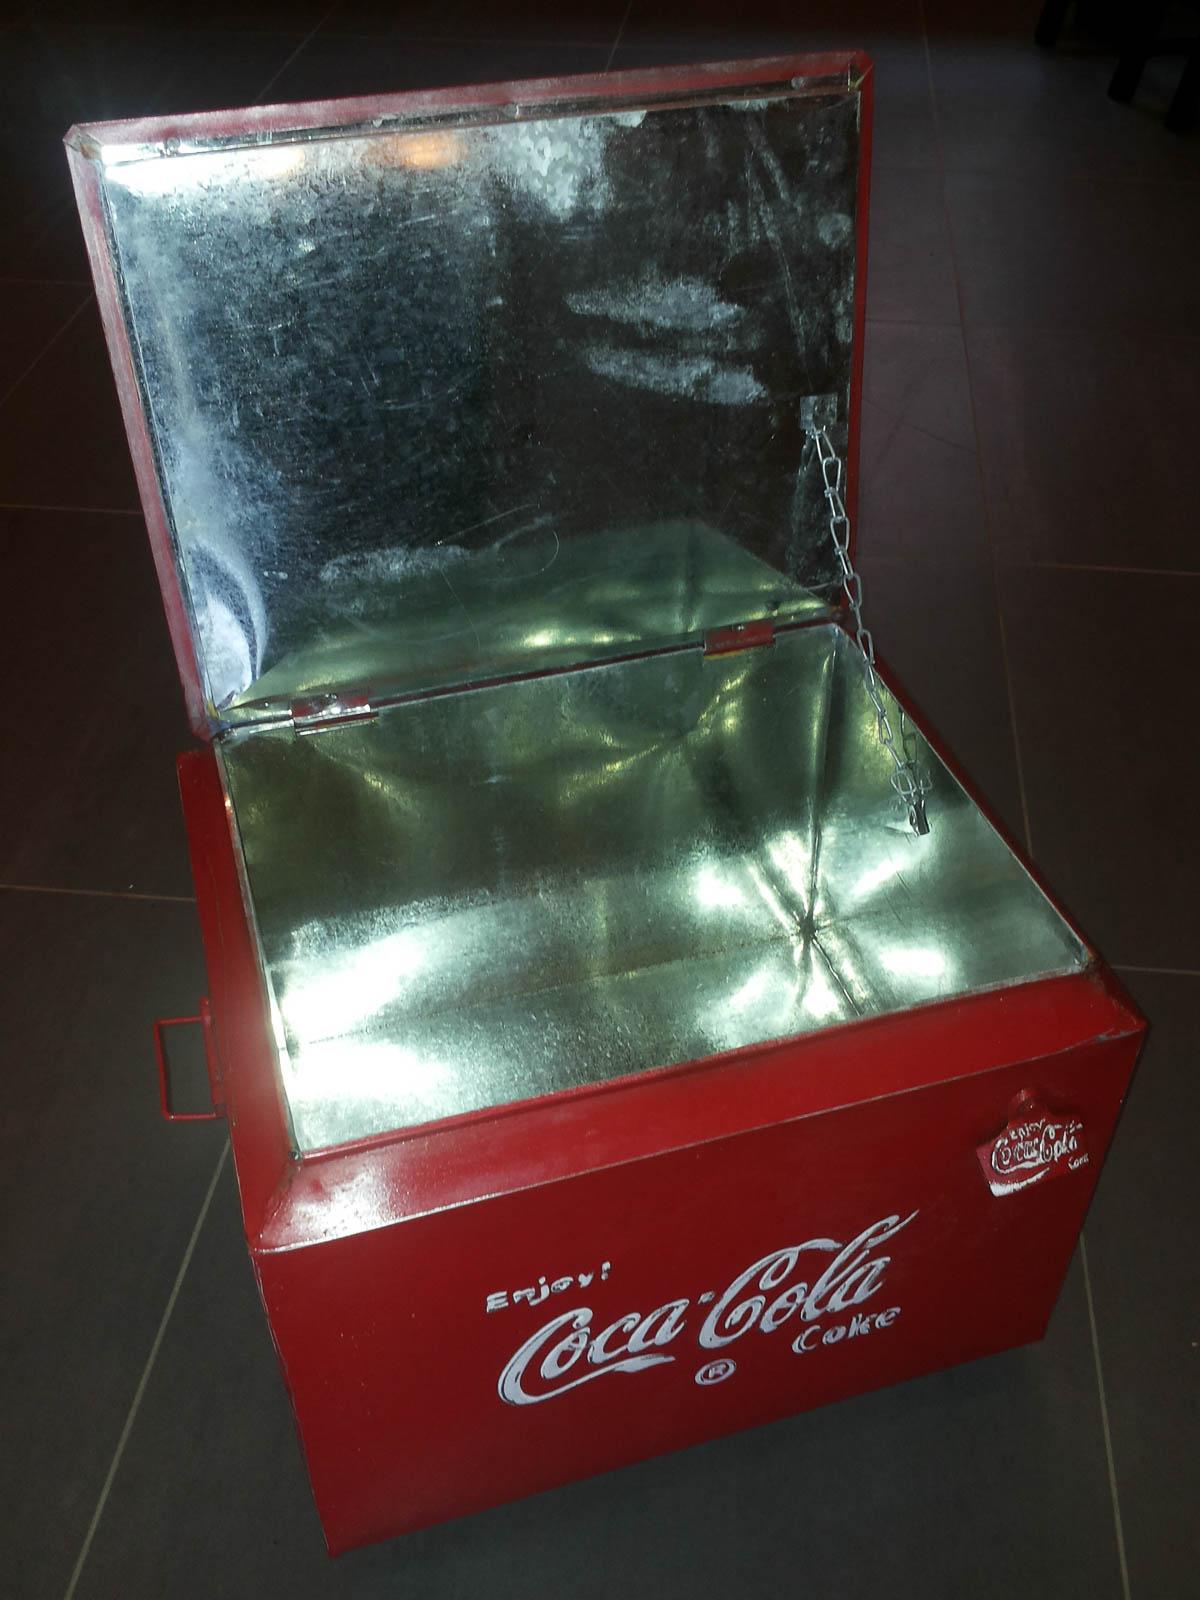 glaci re vintage coca cola la case d co. Black Bedroom Furniture Sets. Home Design Ideas